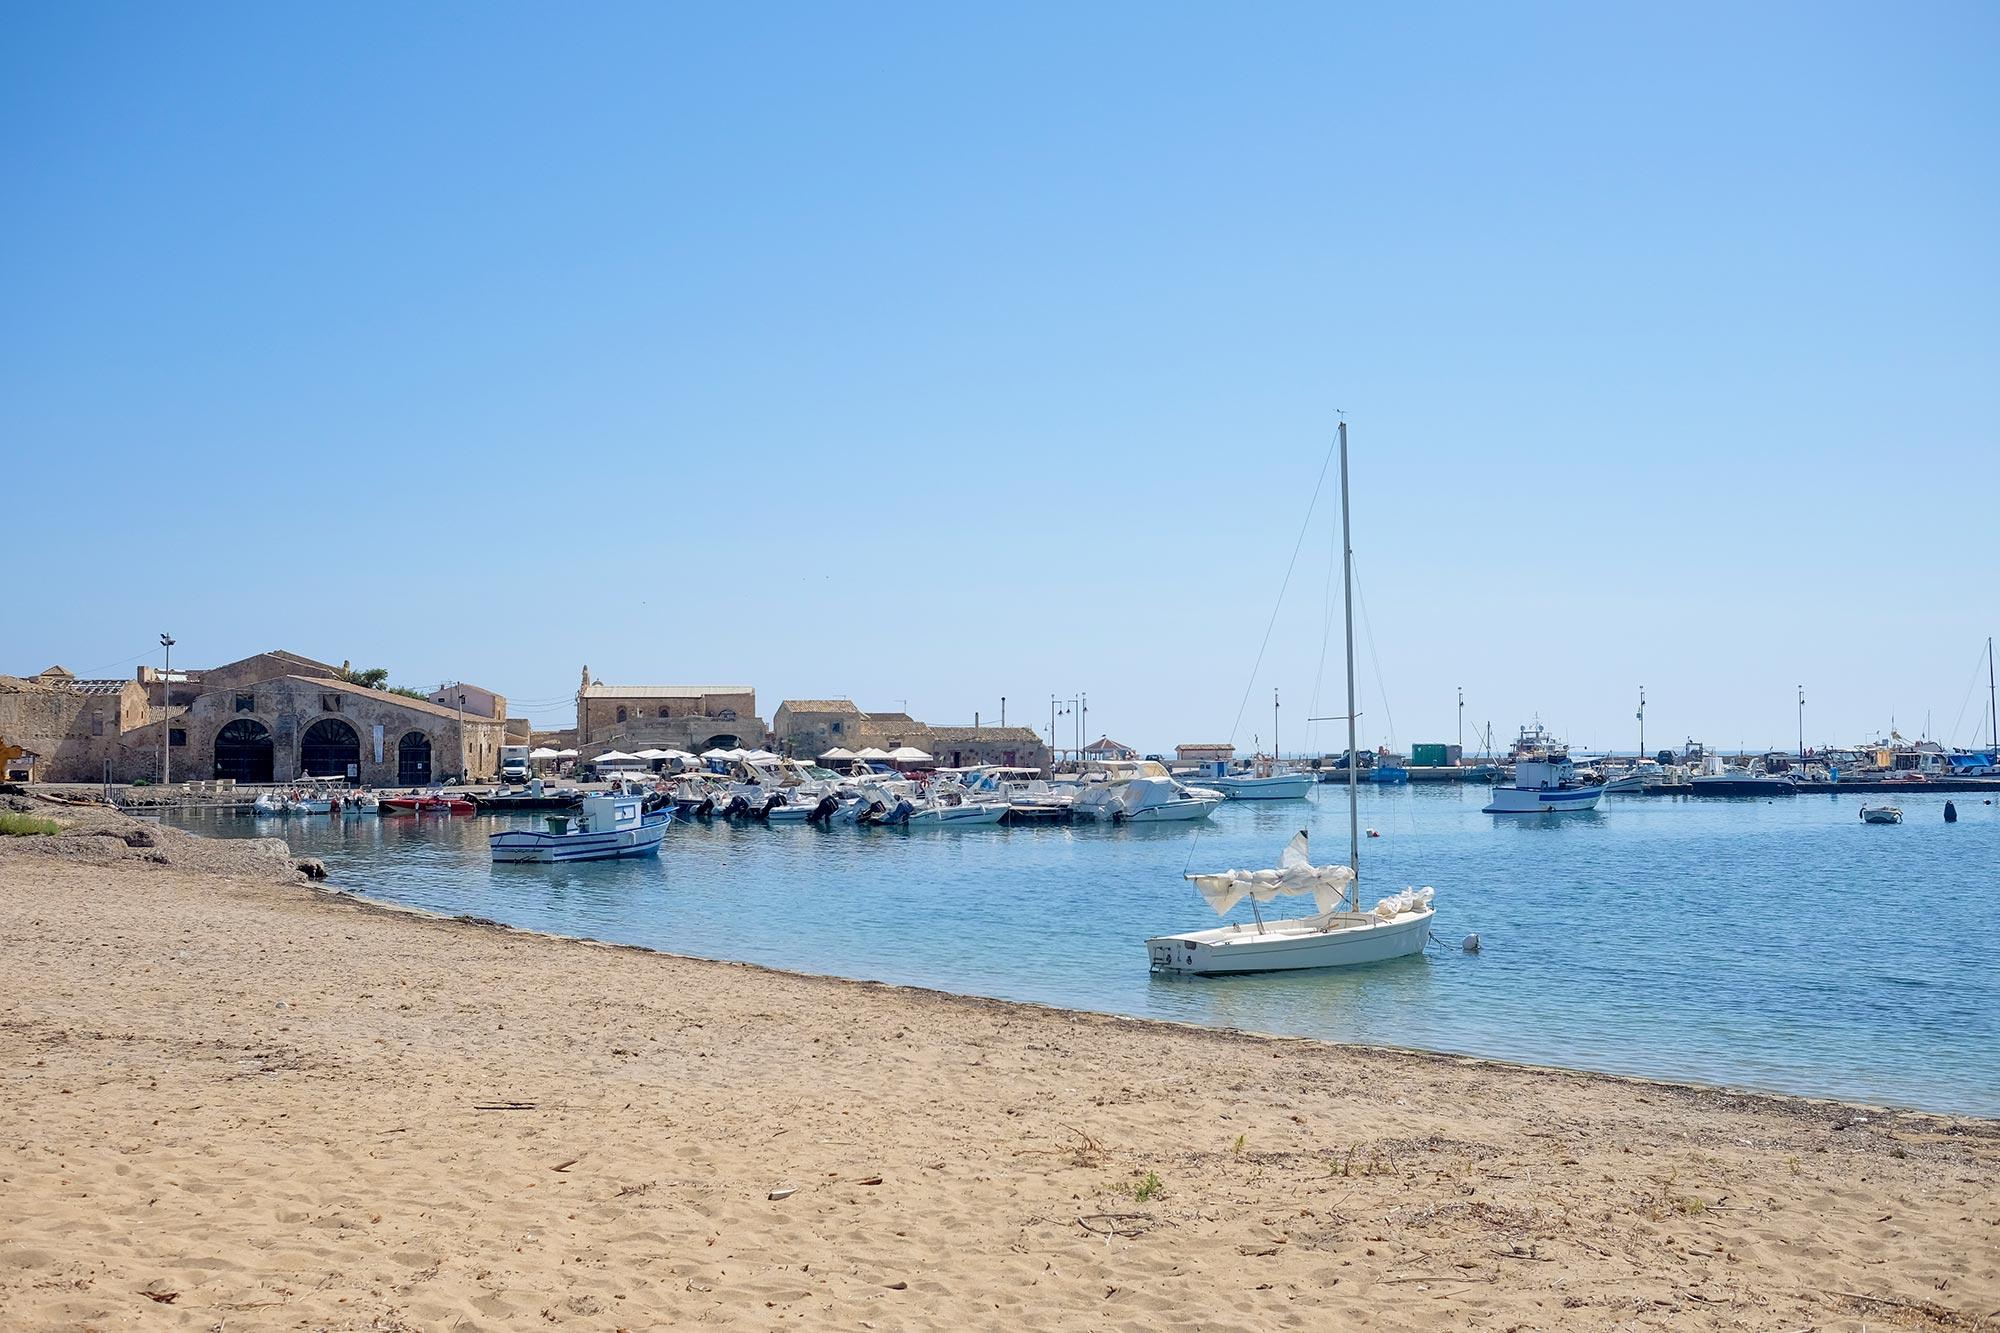 italy-sicilia-marzamemi-tonnara1